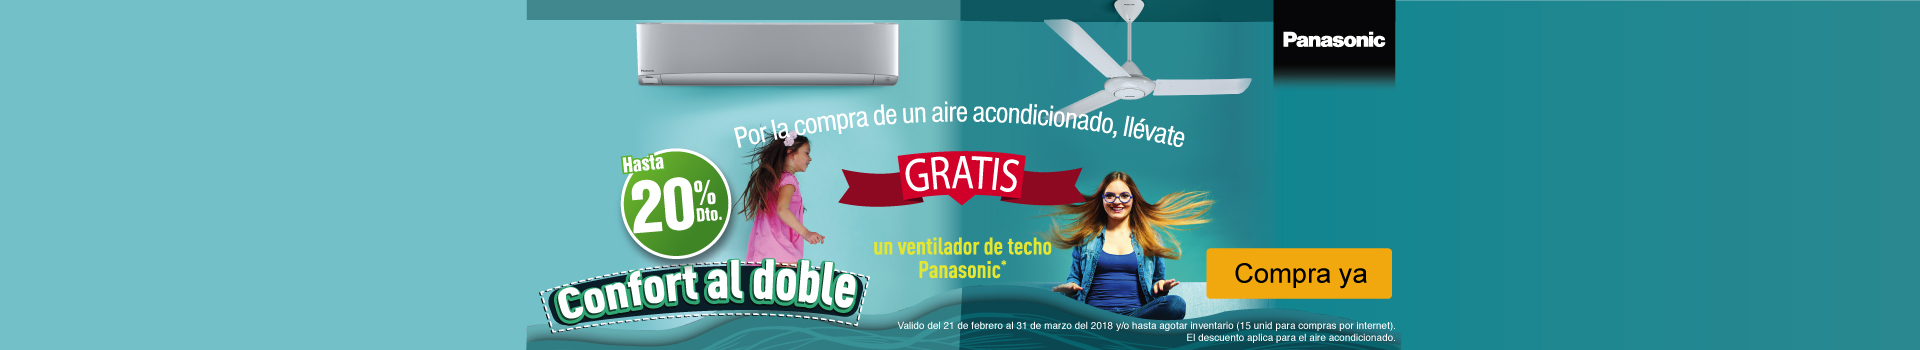 CAT-CLIM-AKyKT-1-lb-Aires-Acondicionados-PANASONIC-gratis-ventilador-techo-cat-febrero21-23